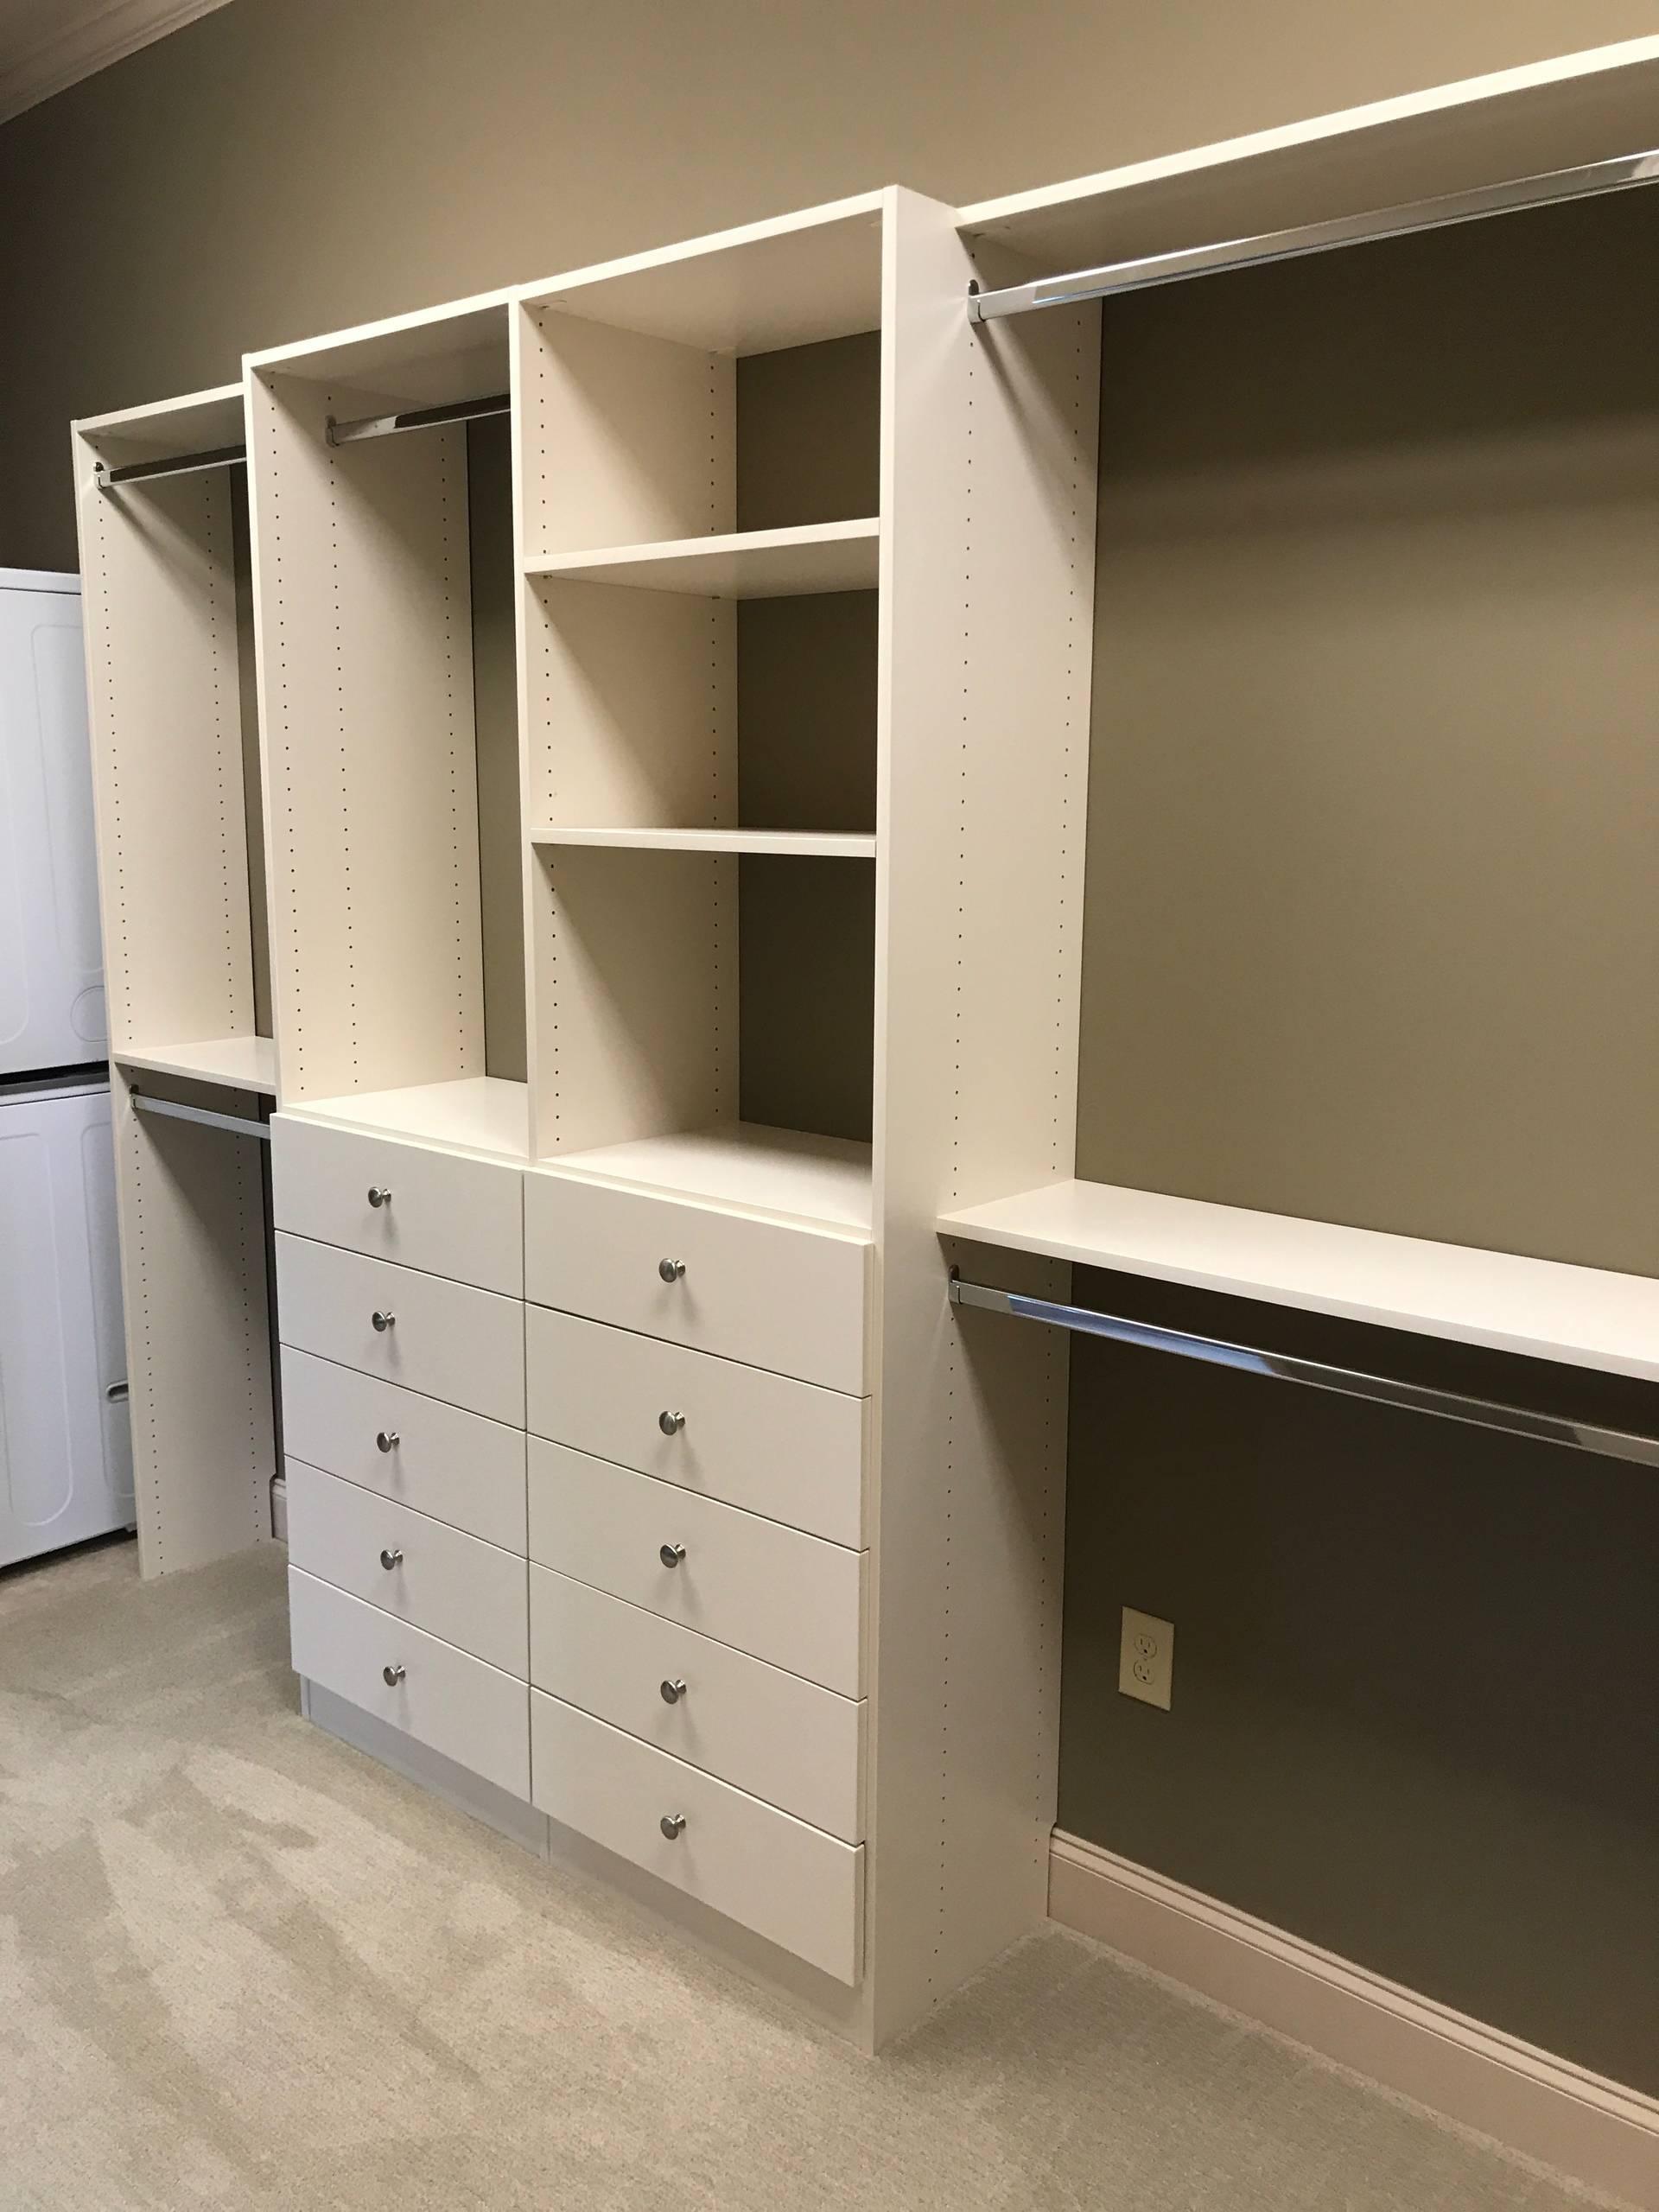 Walk-in Closet & Laundry area in Moore, SC